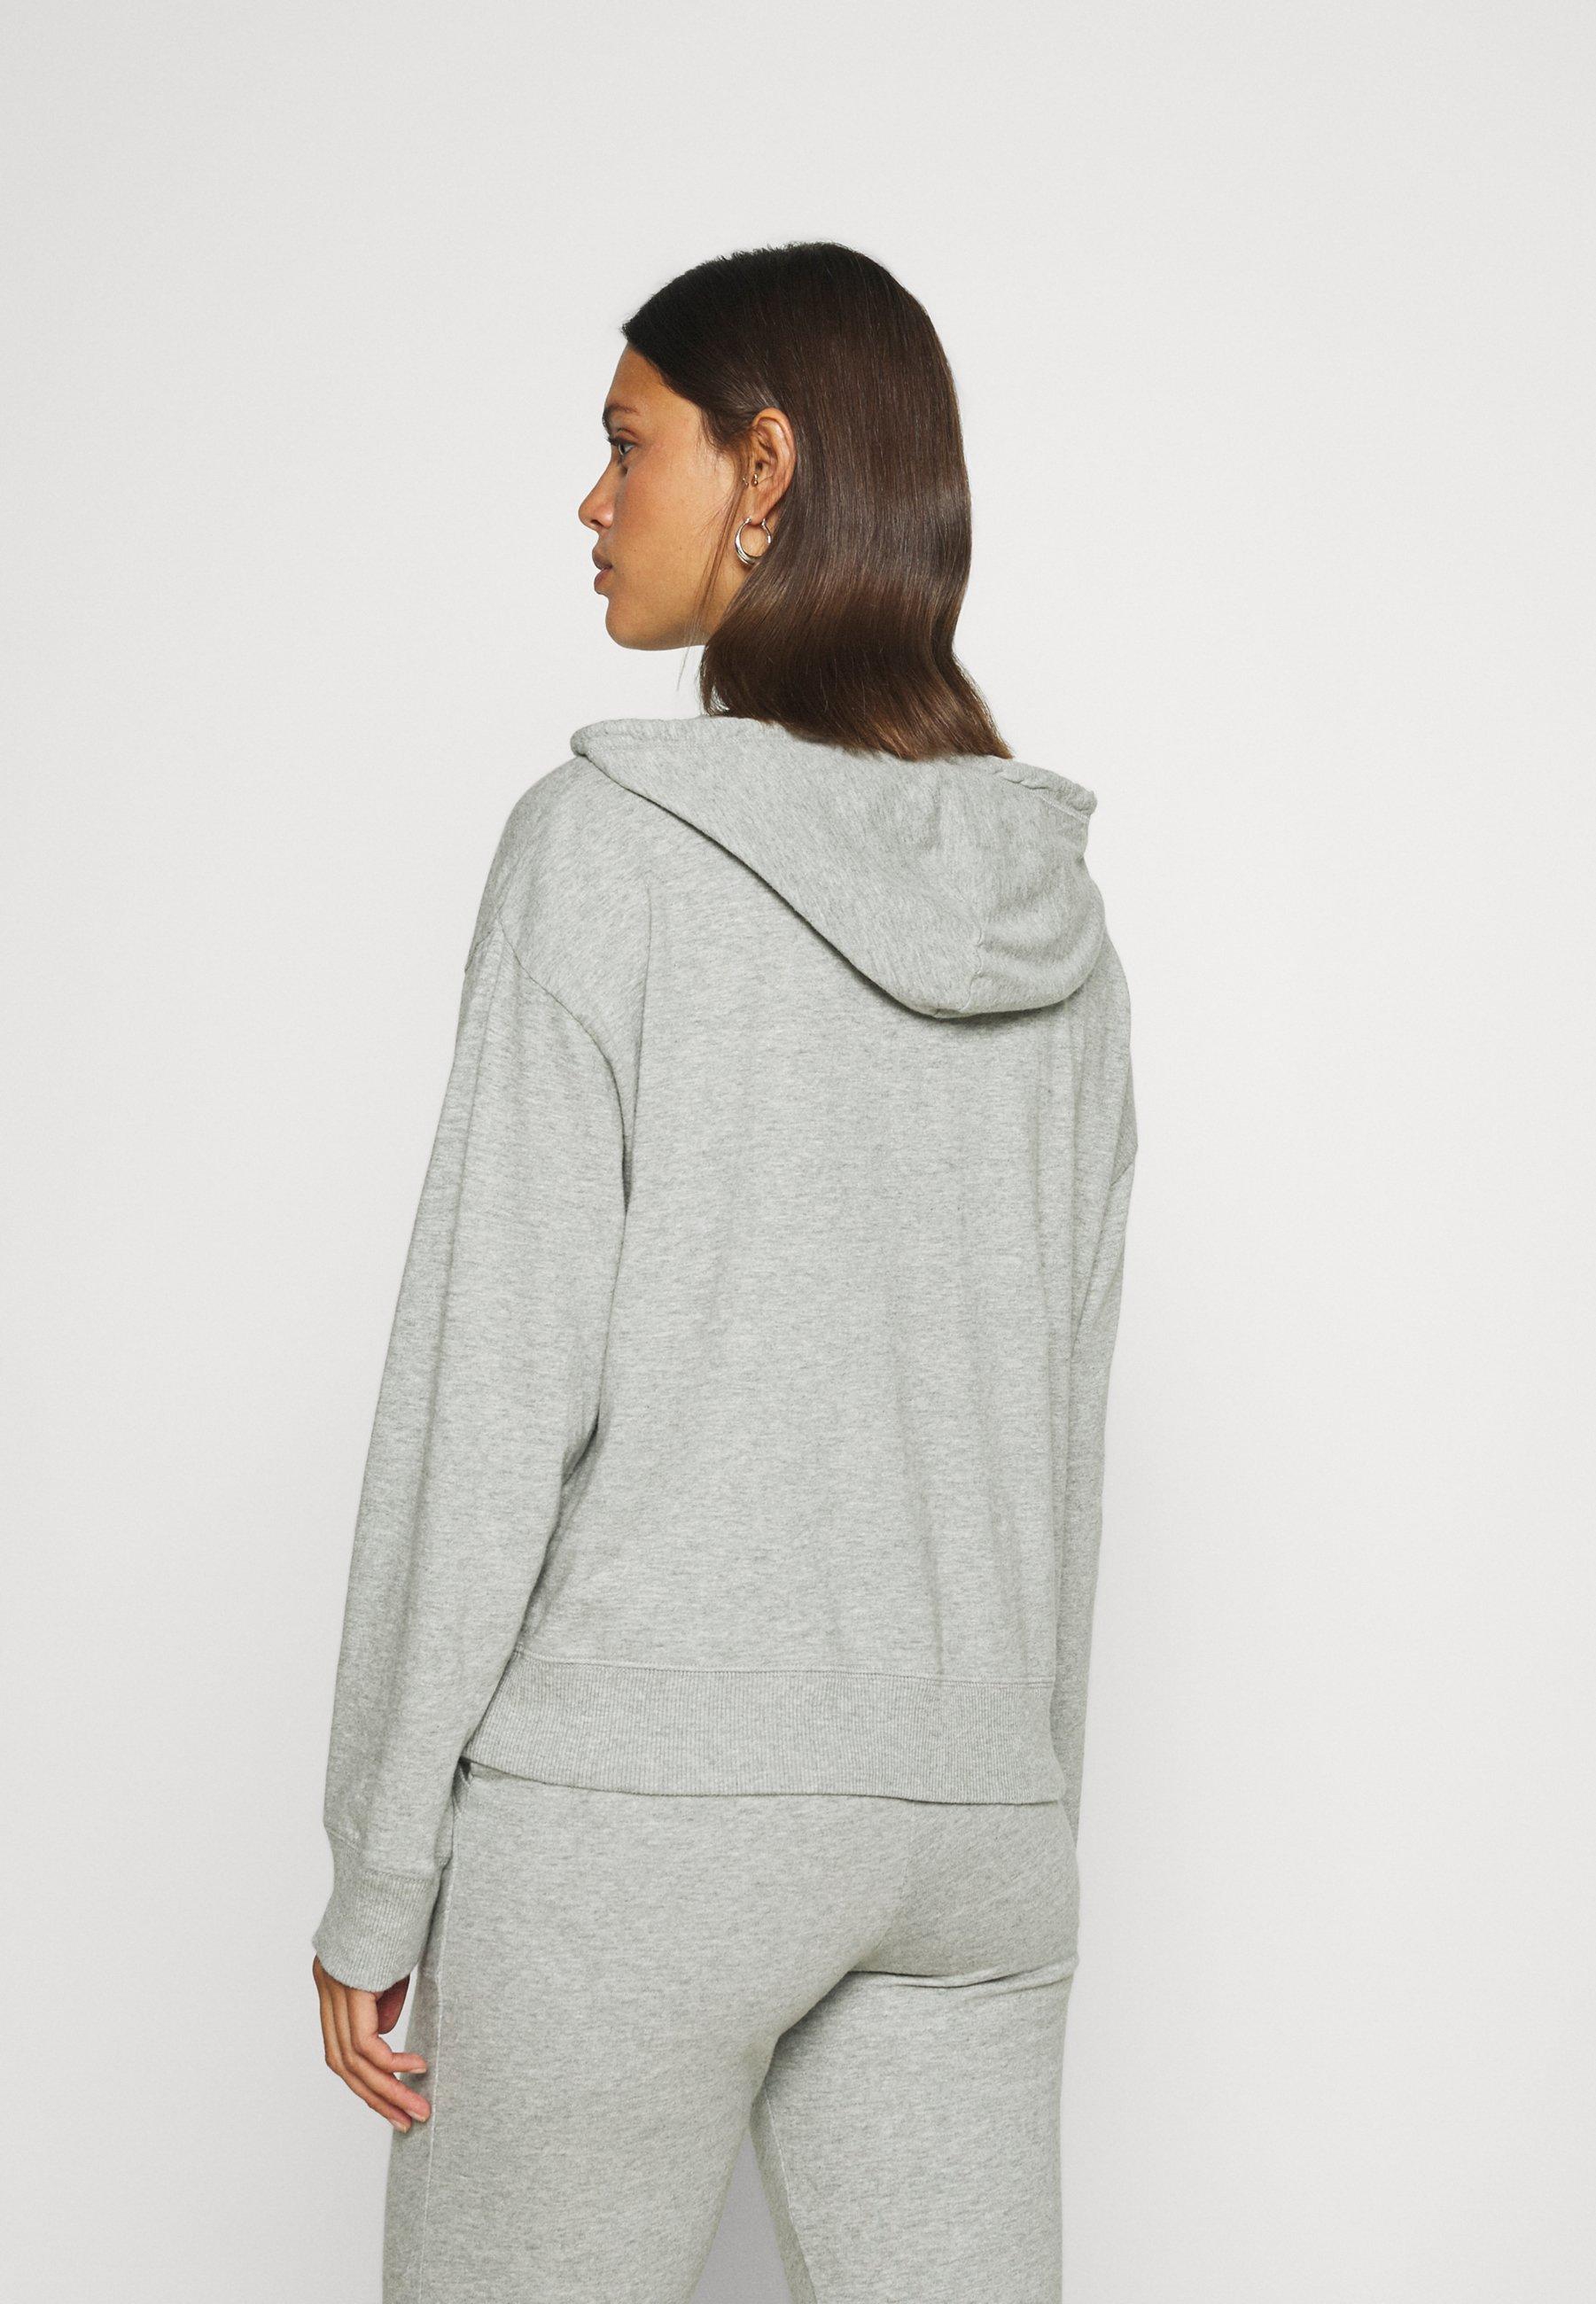 Donna SLUB HOODIE - Maglia del pigiama